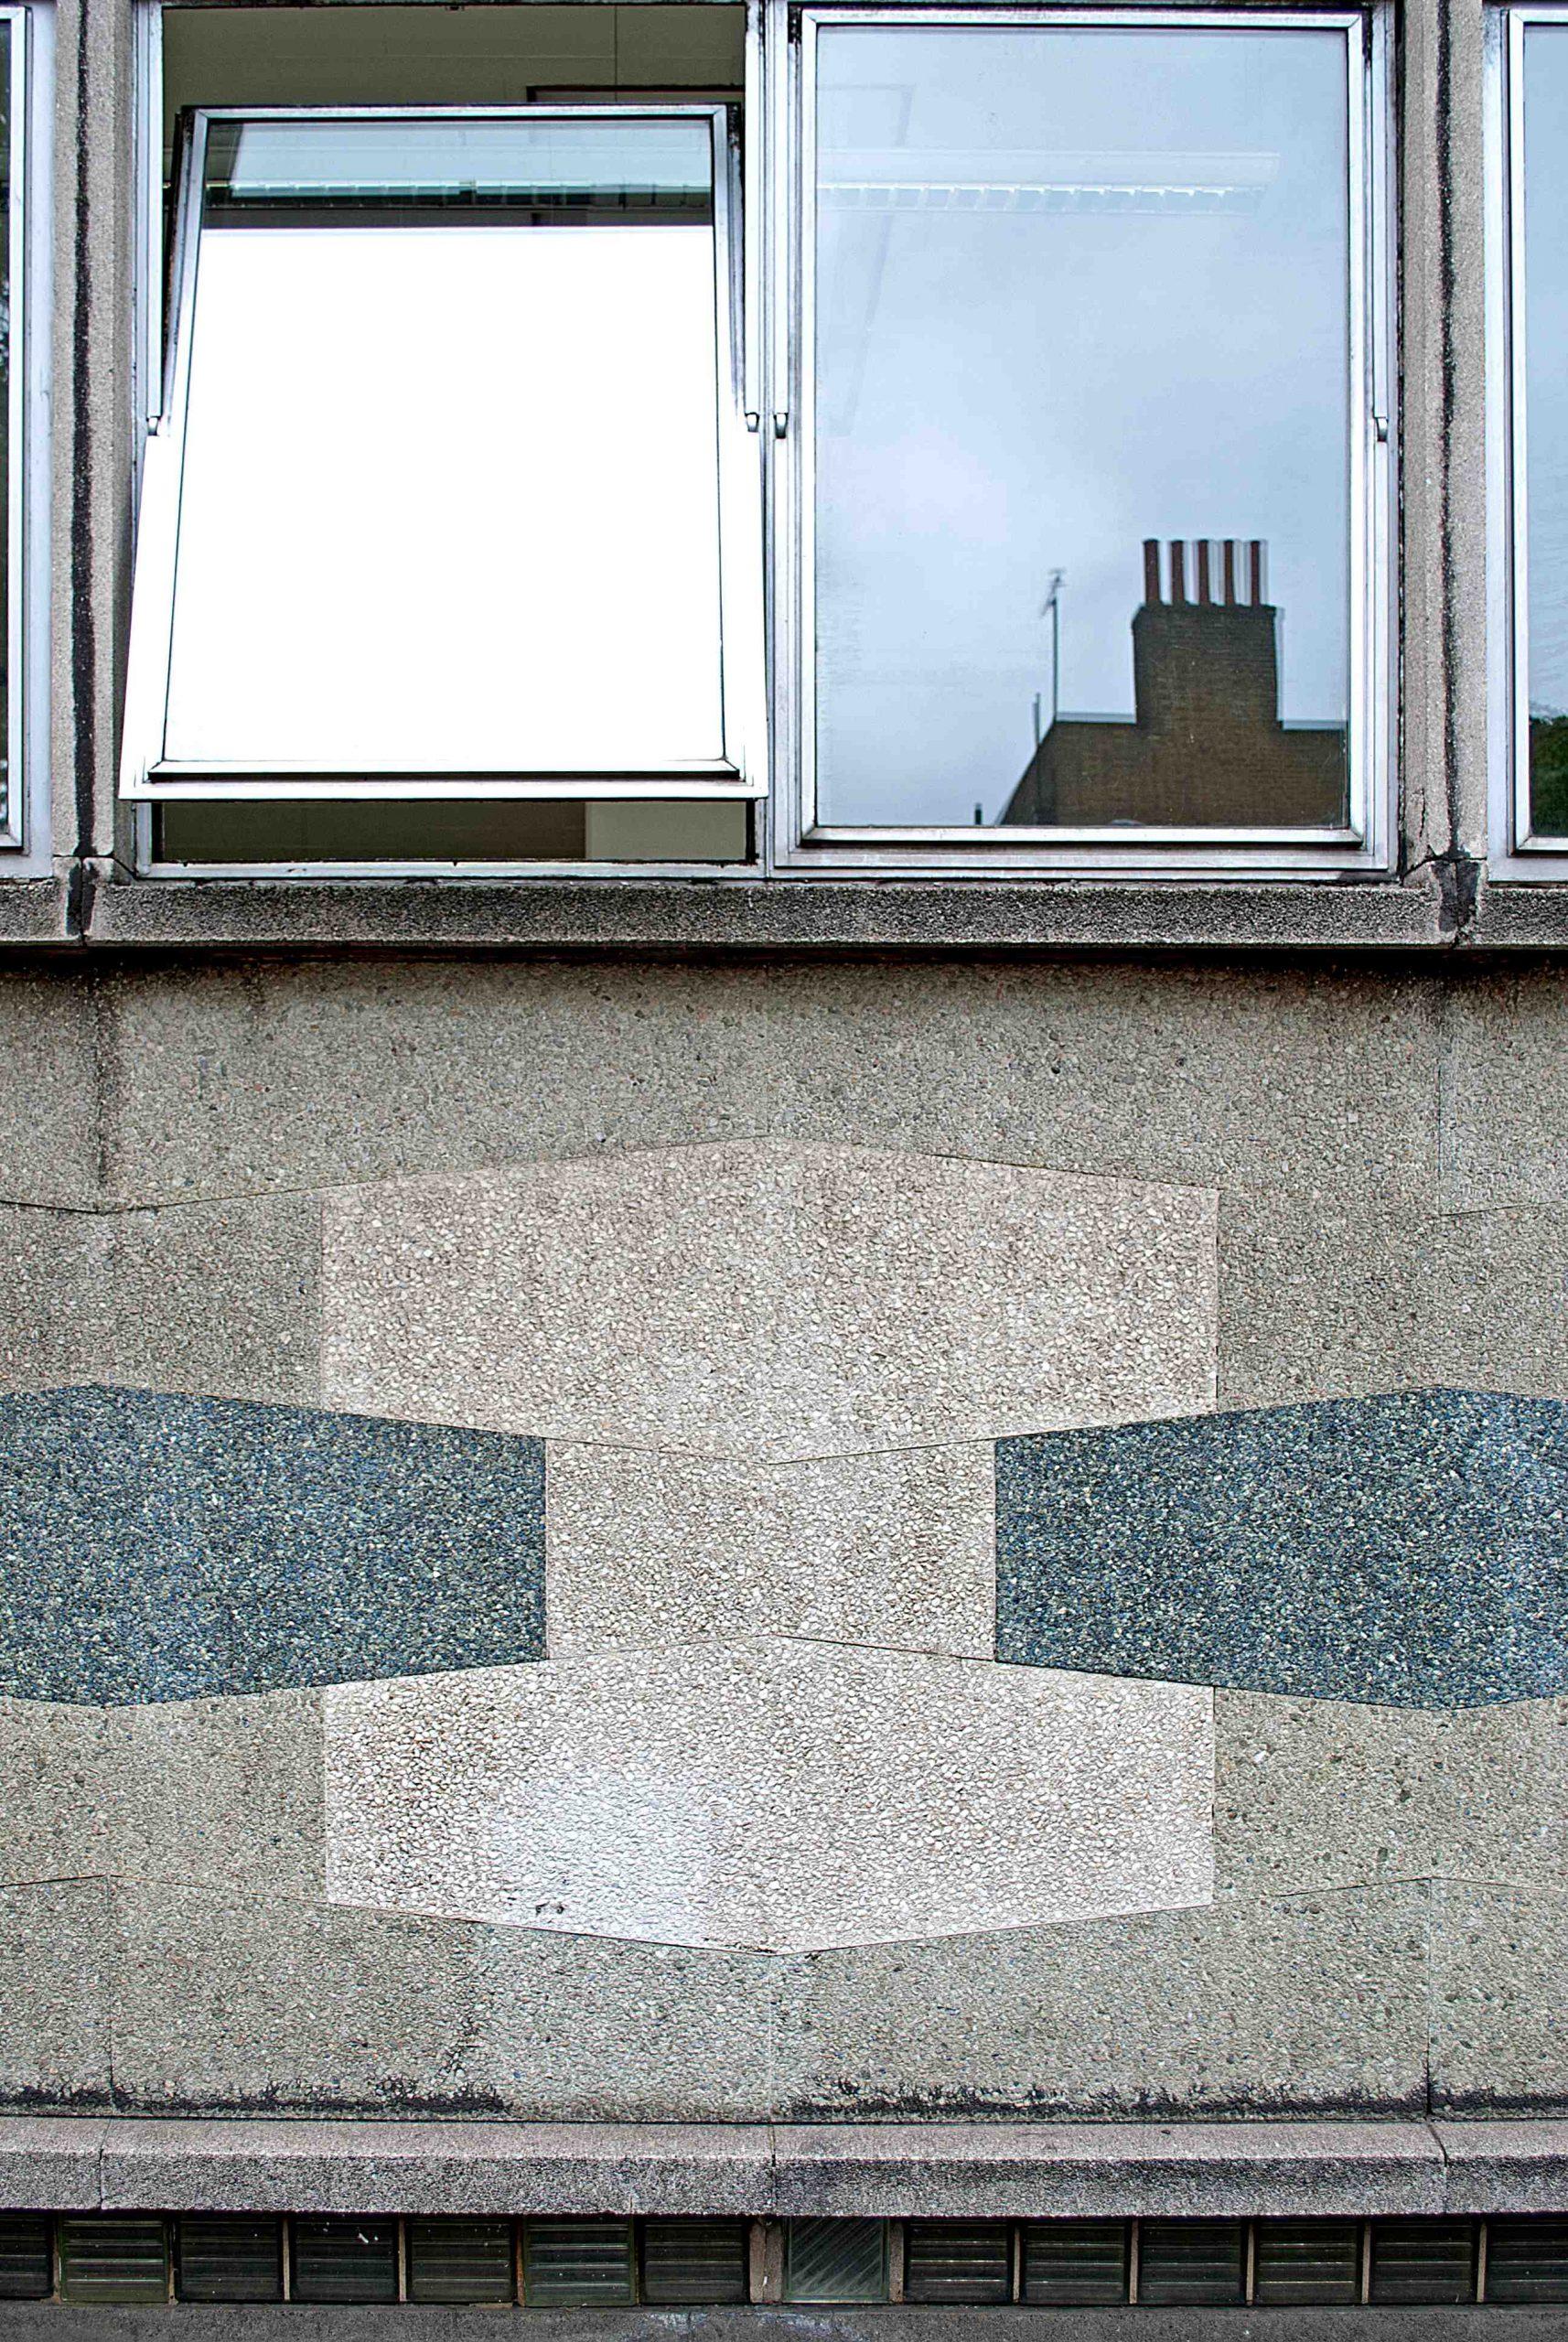 Holborn Library panels below glazing